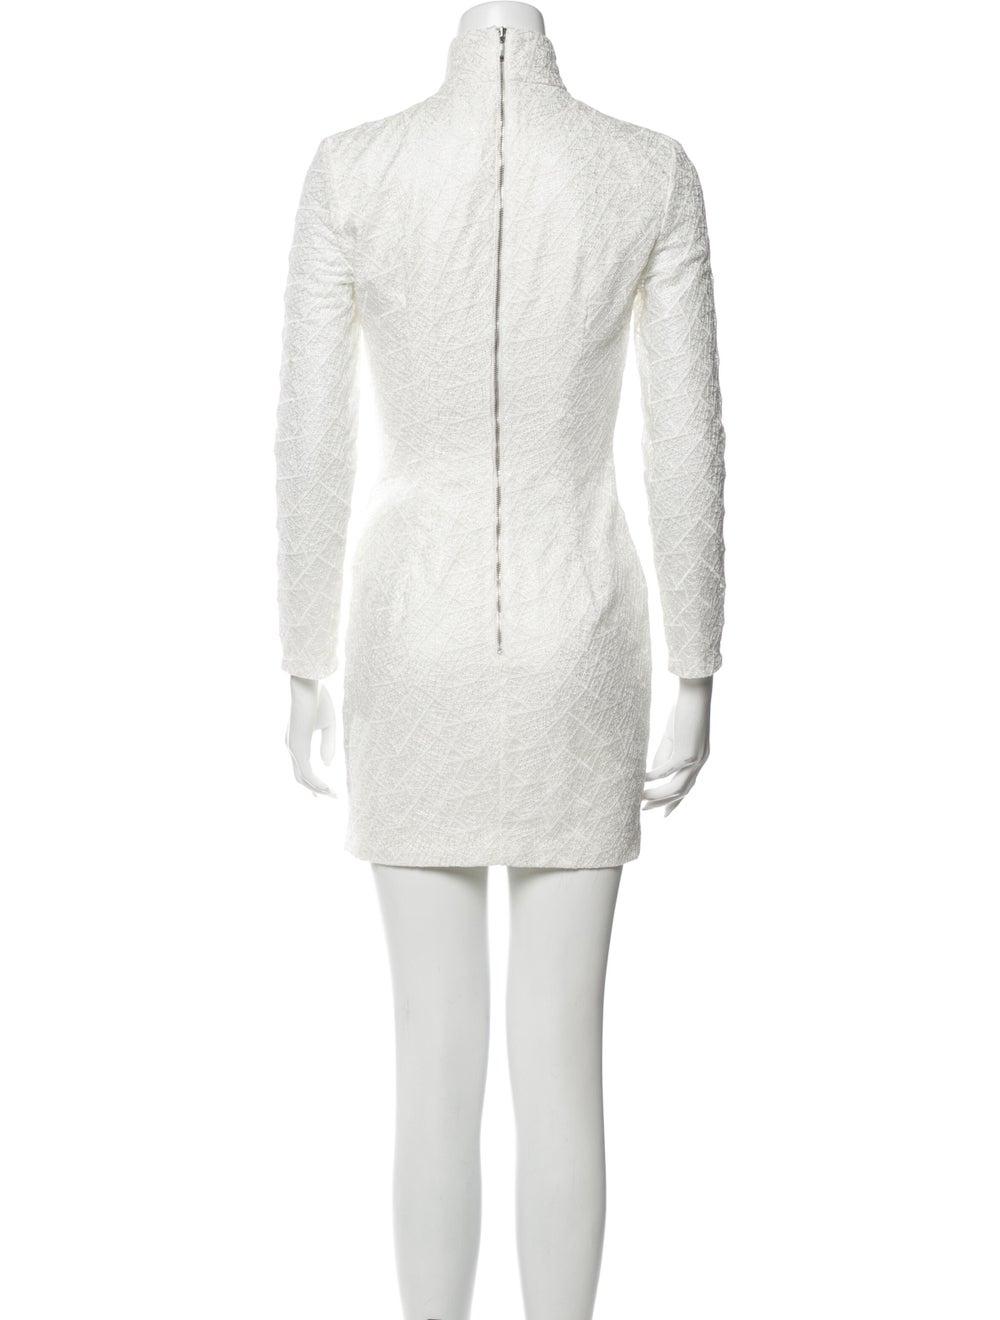 Misha Collection Turtleneck Mini Dress White - image 3